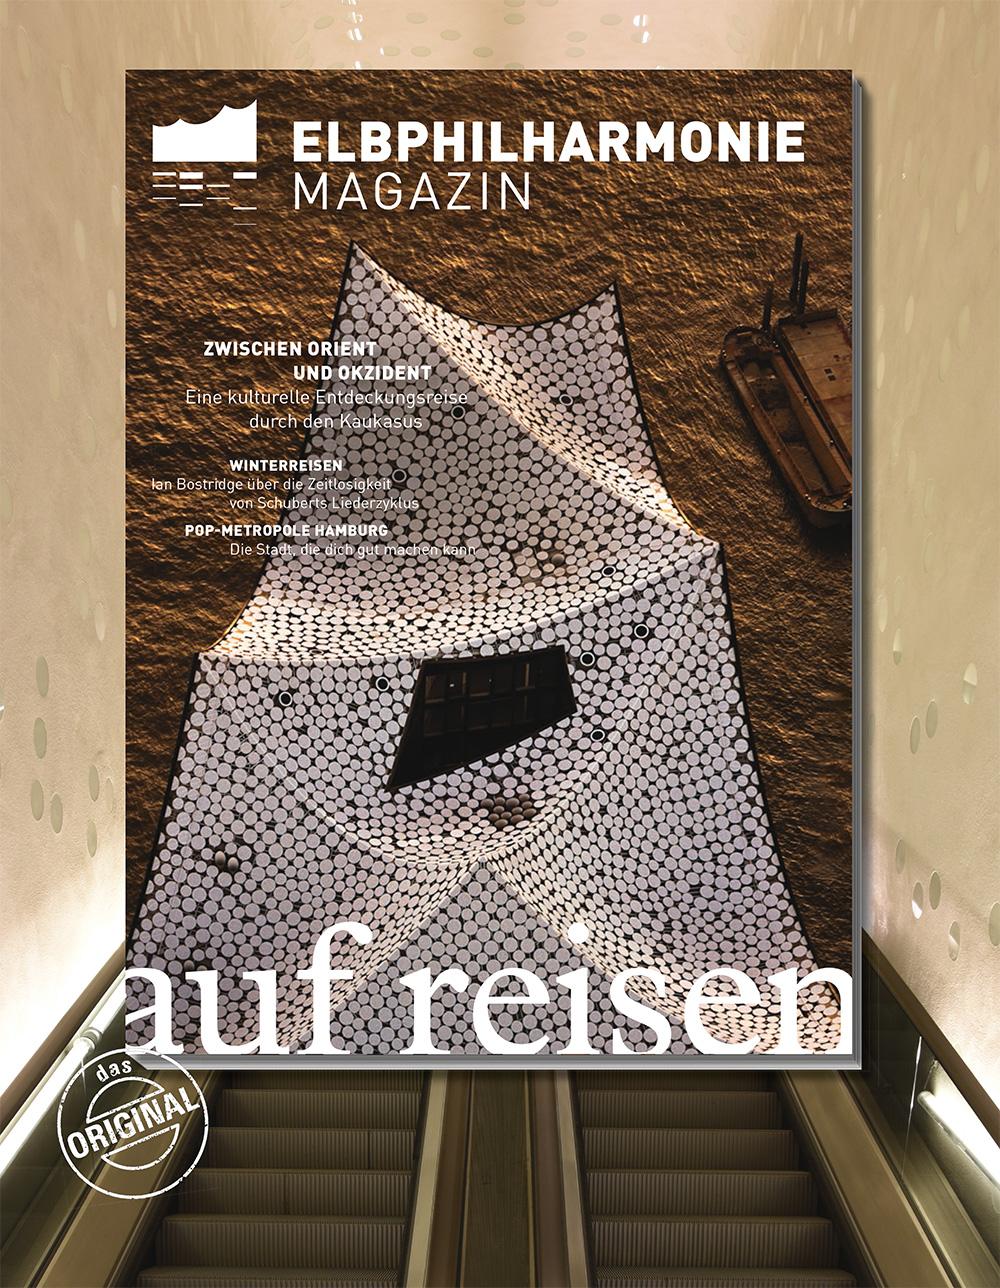 Elbphilharmonie Magazin »Auf Reisen«